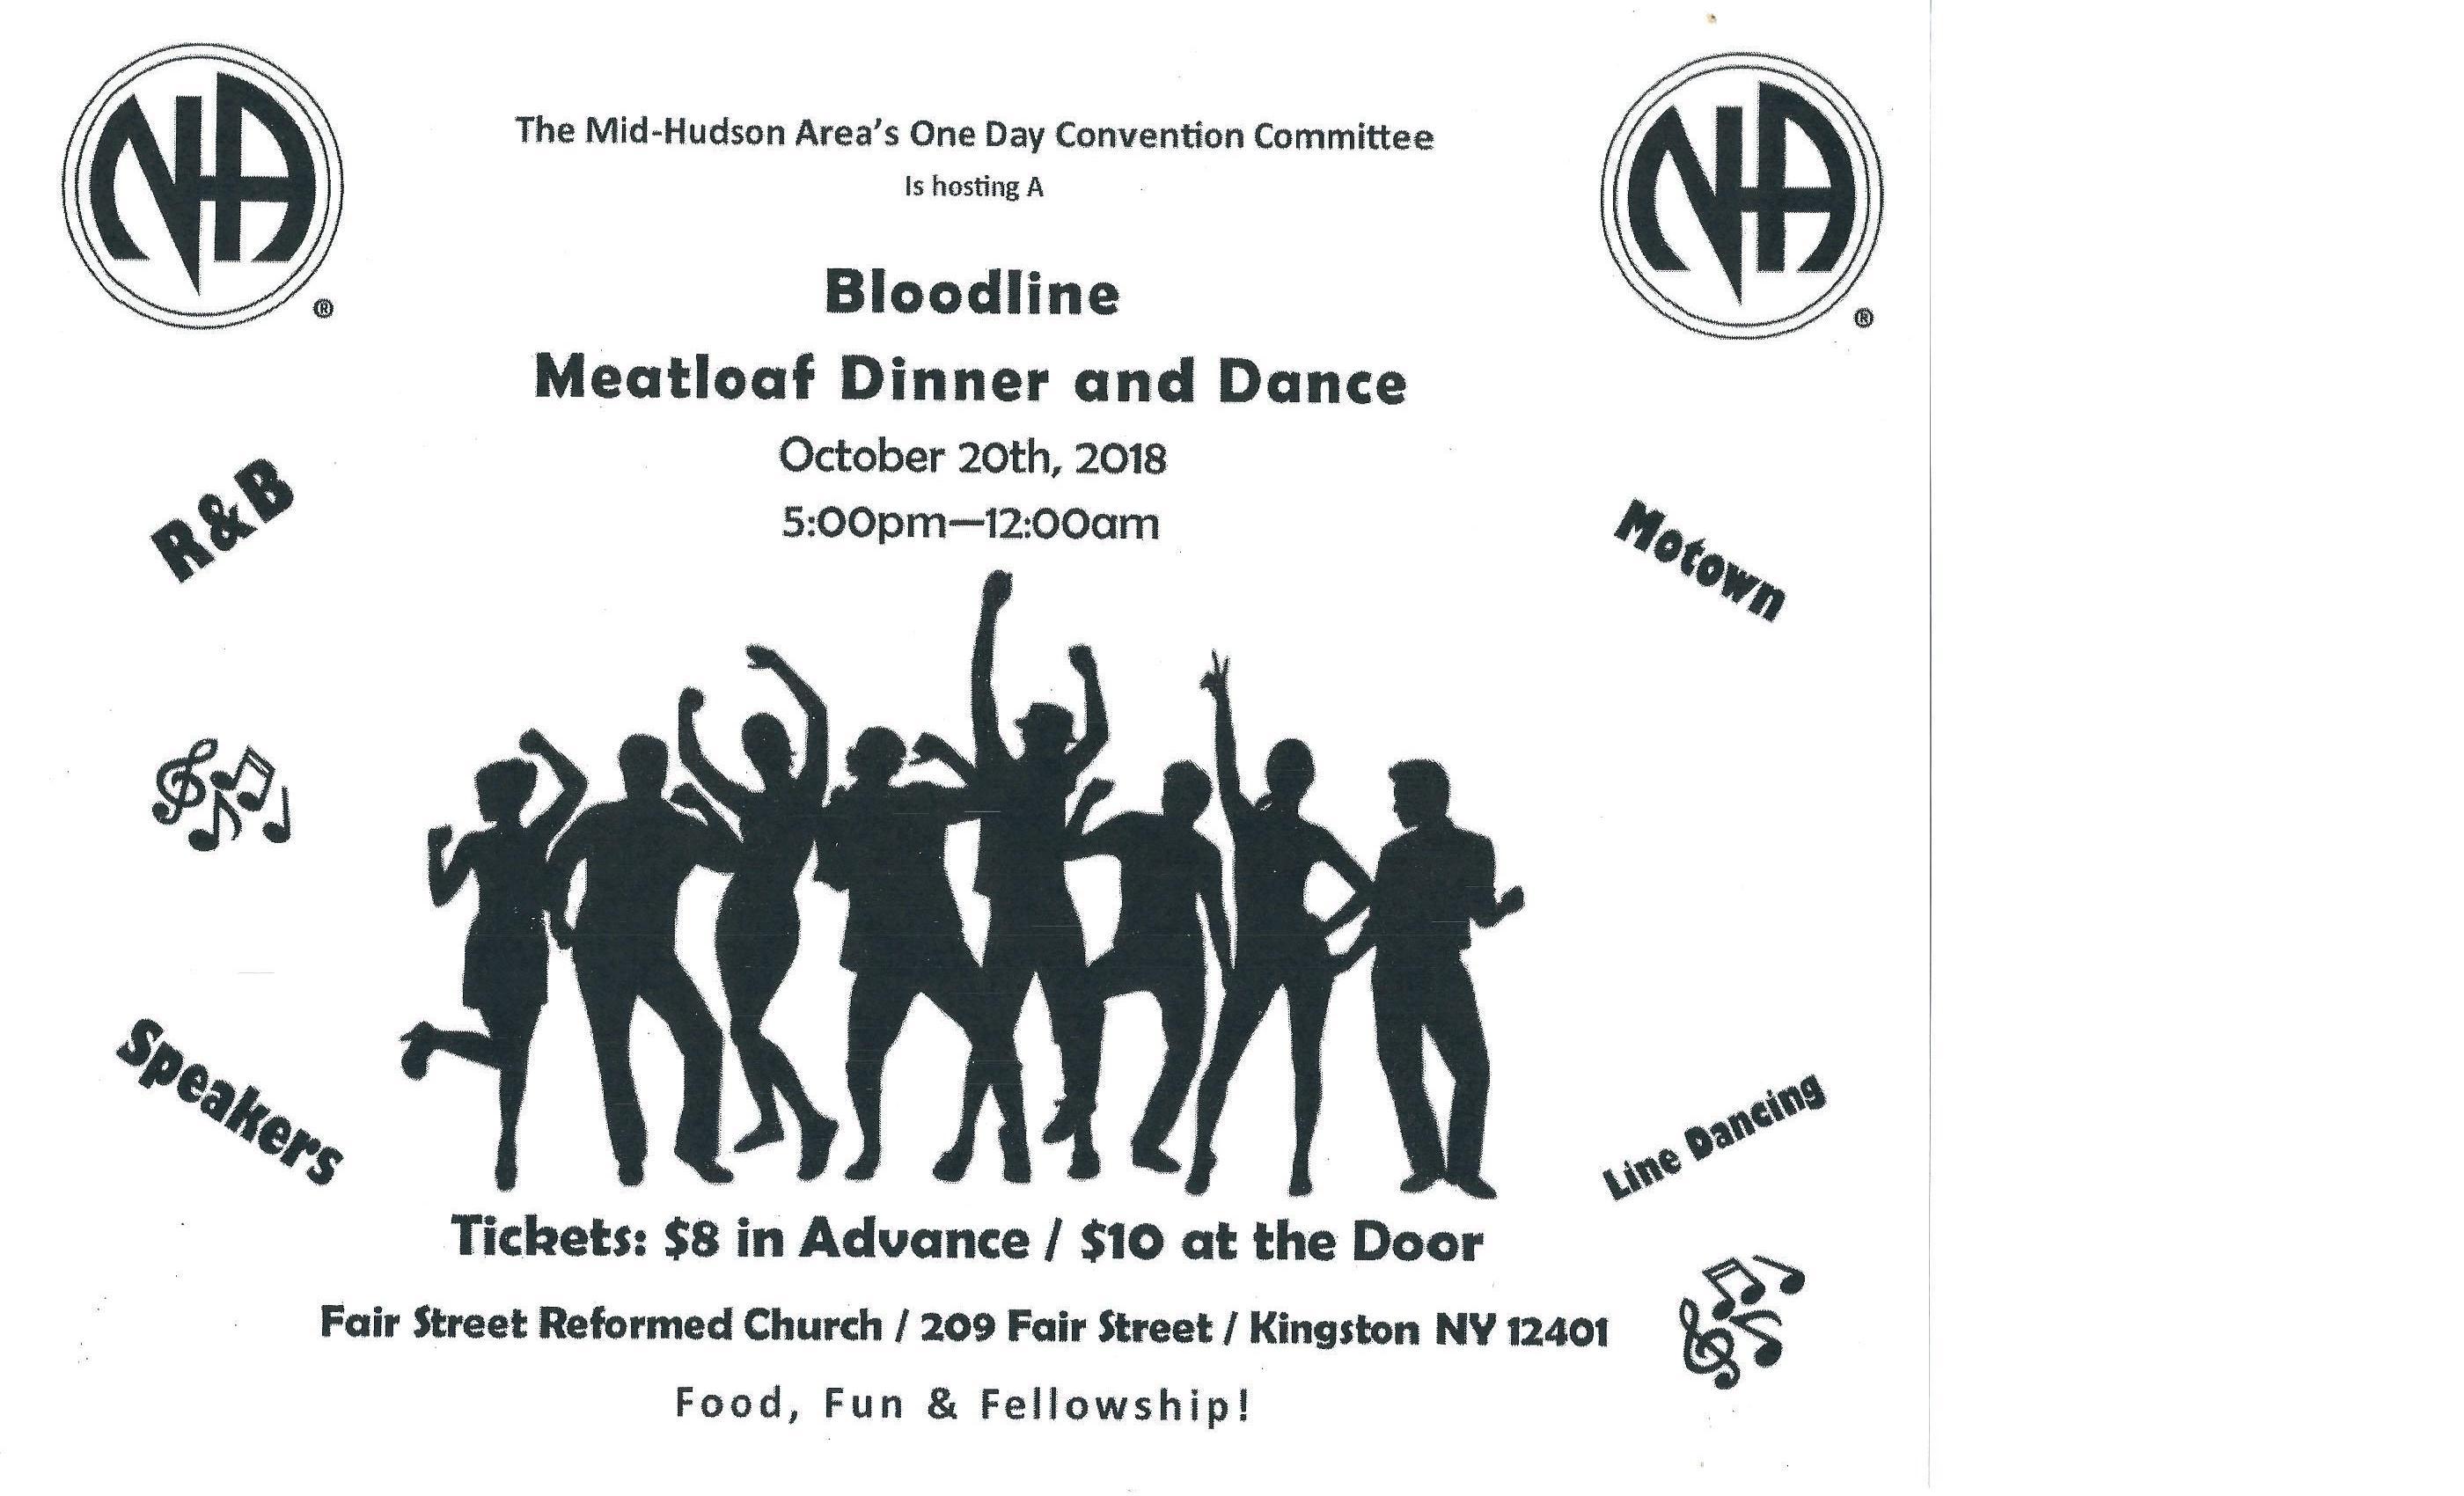 Bloodline Meatloaf Dinner and Dance @ Fair Street Reformed Church | Kingston | New York | United States